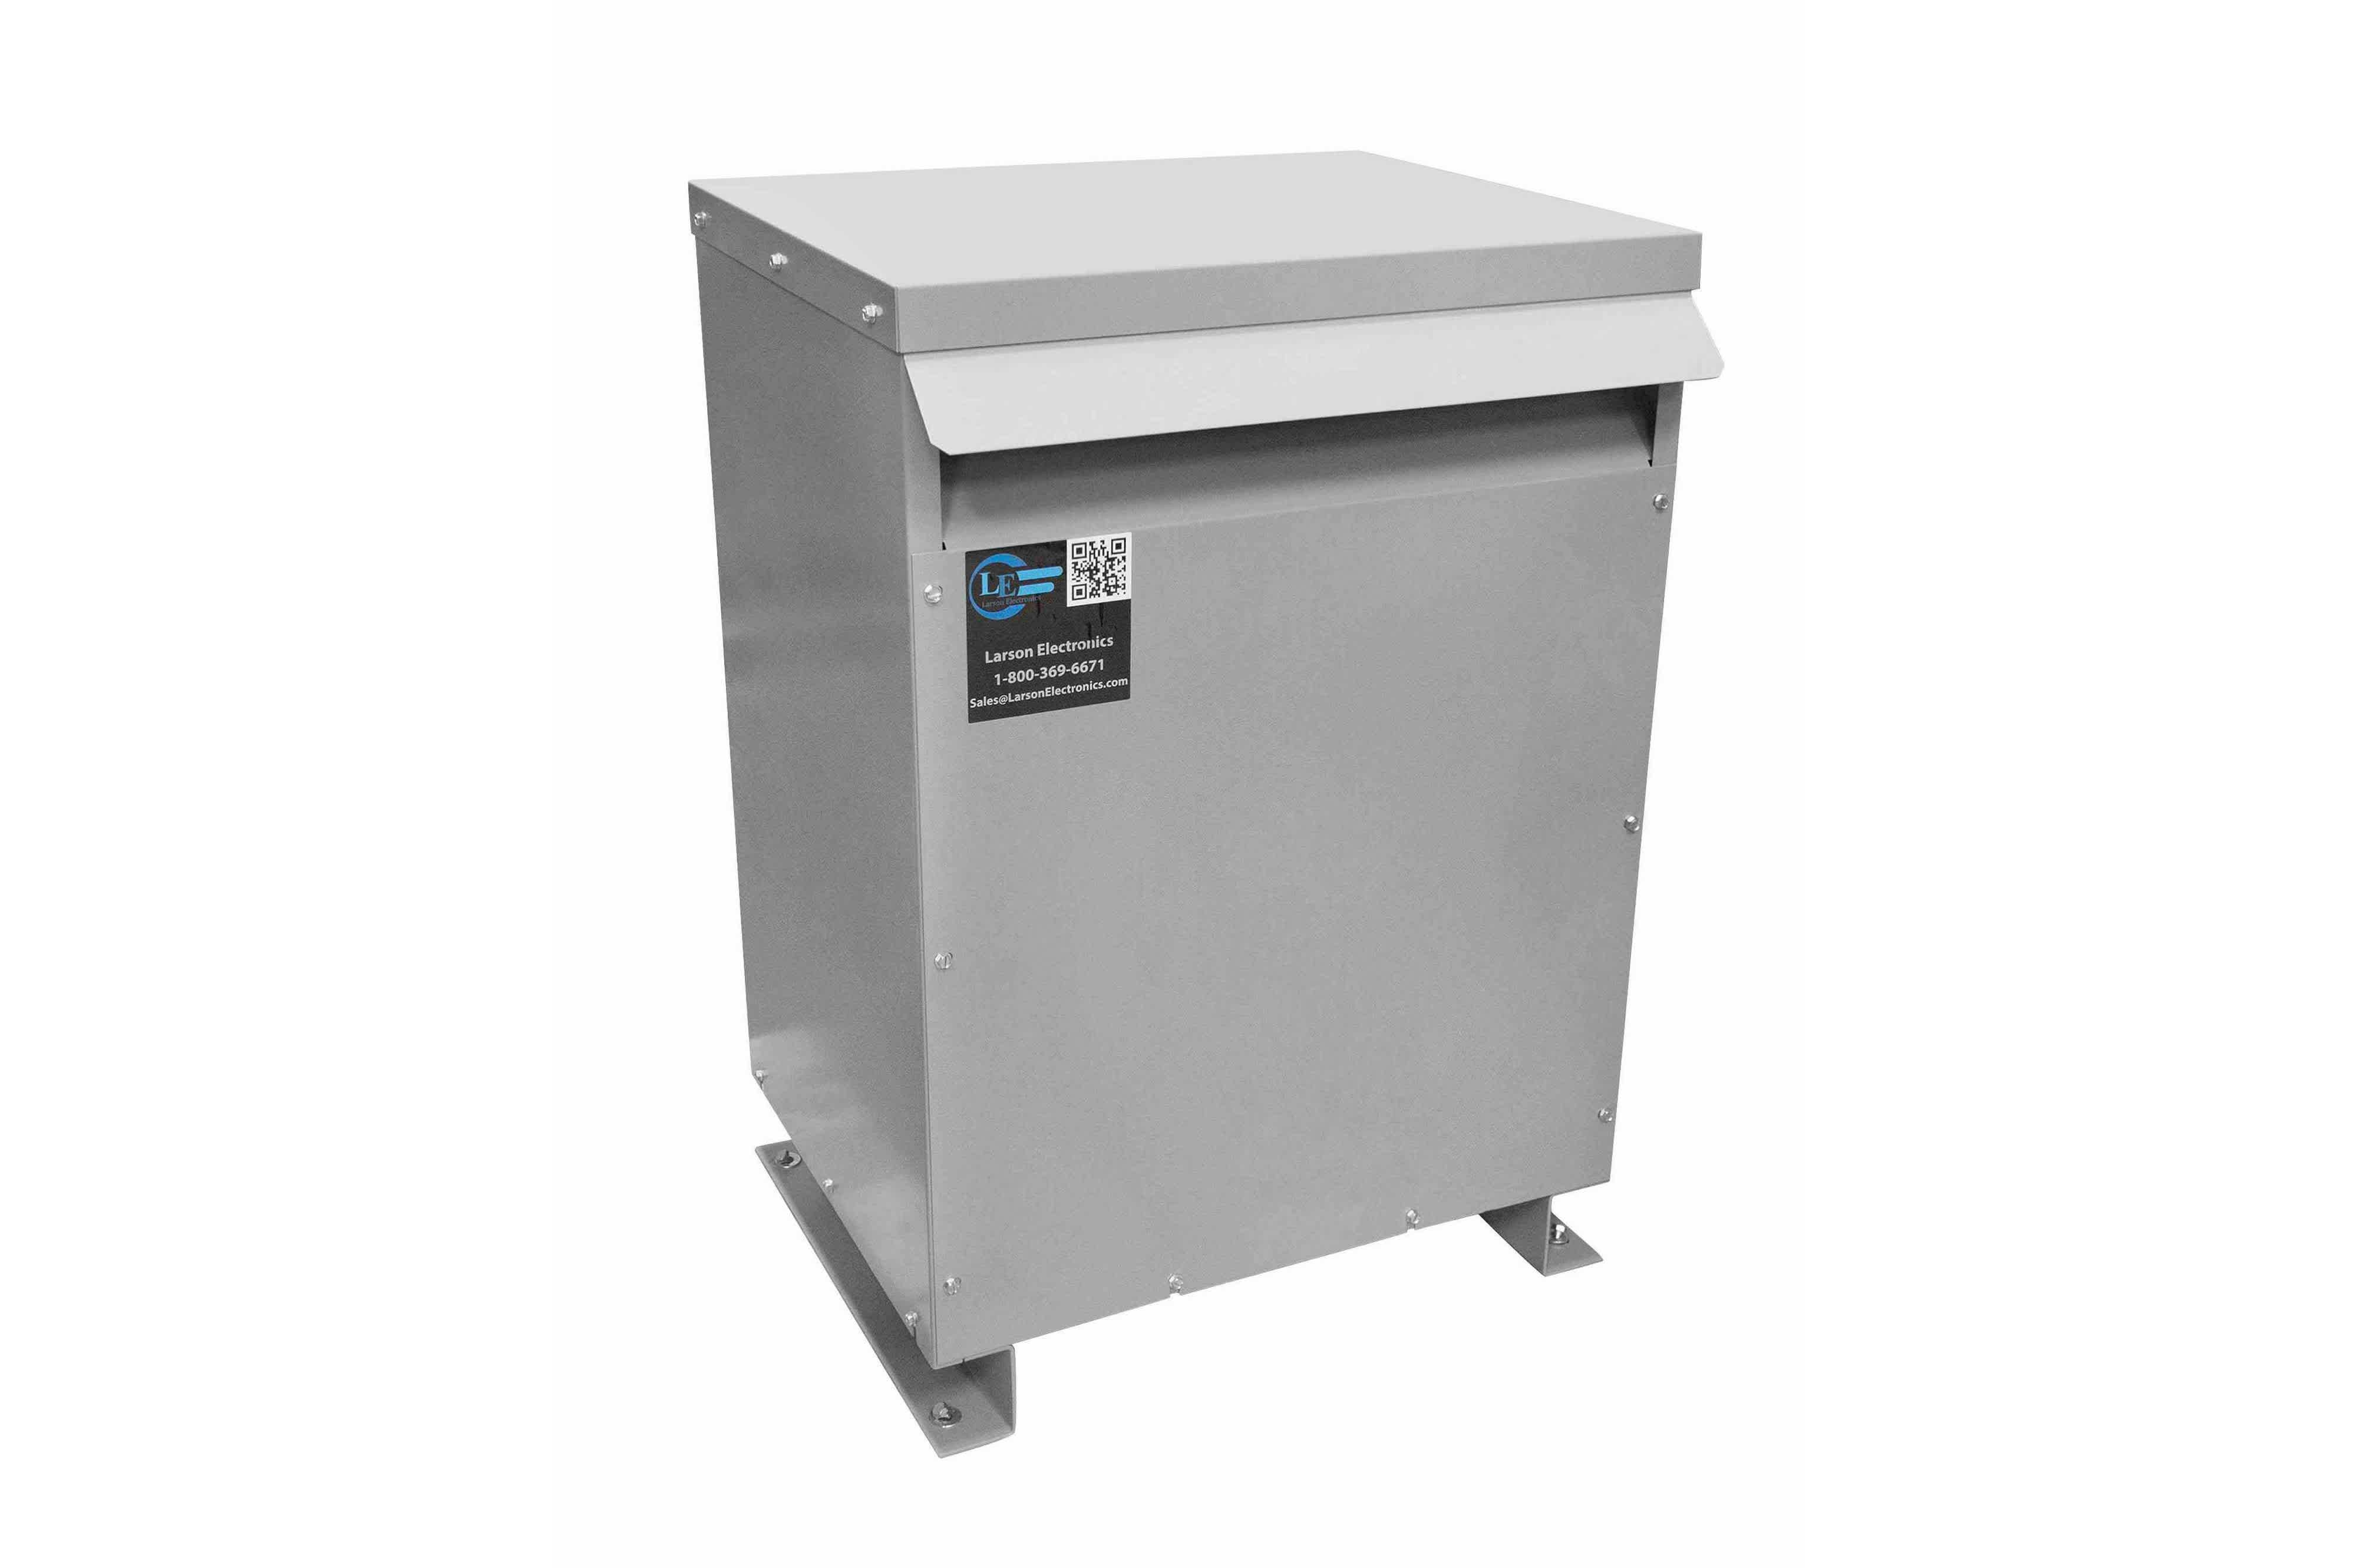 27 kVA 3PH Isolation Transformer, 240V Wye Primary, 208V Delta Secondary, N3R, Ventilated, 60 Hz